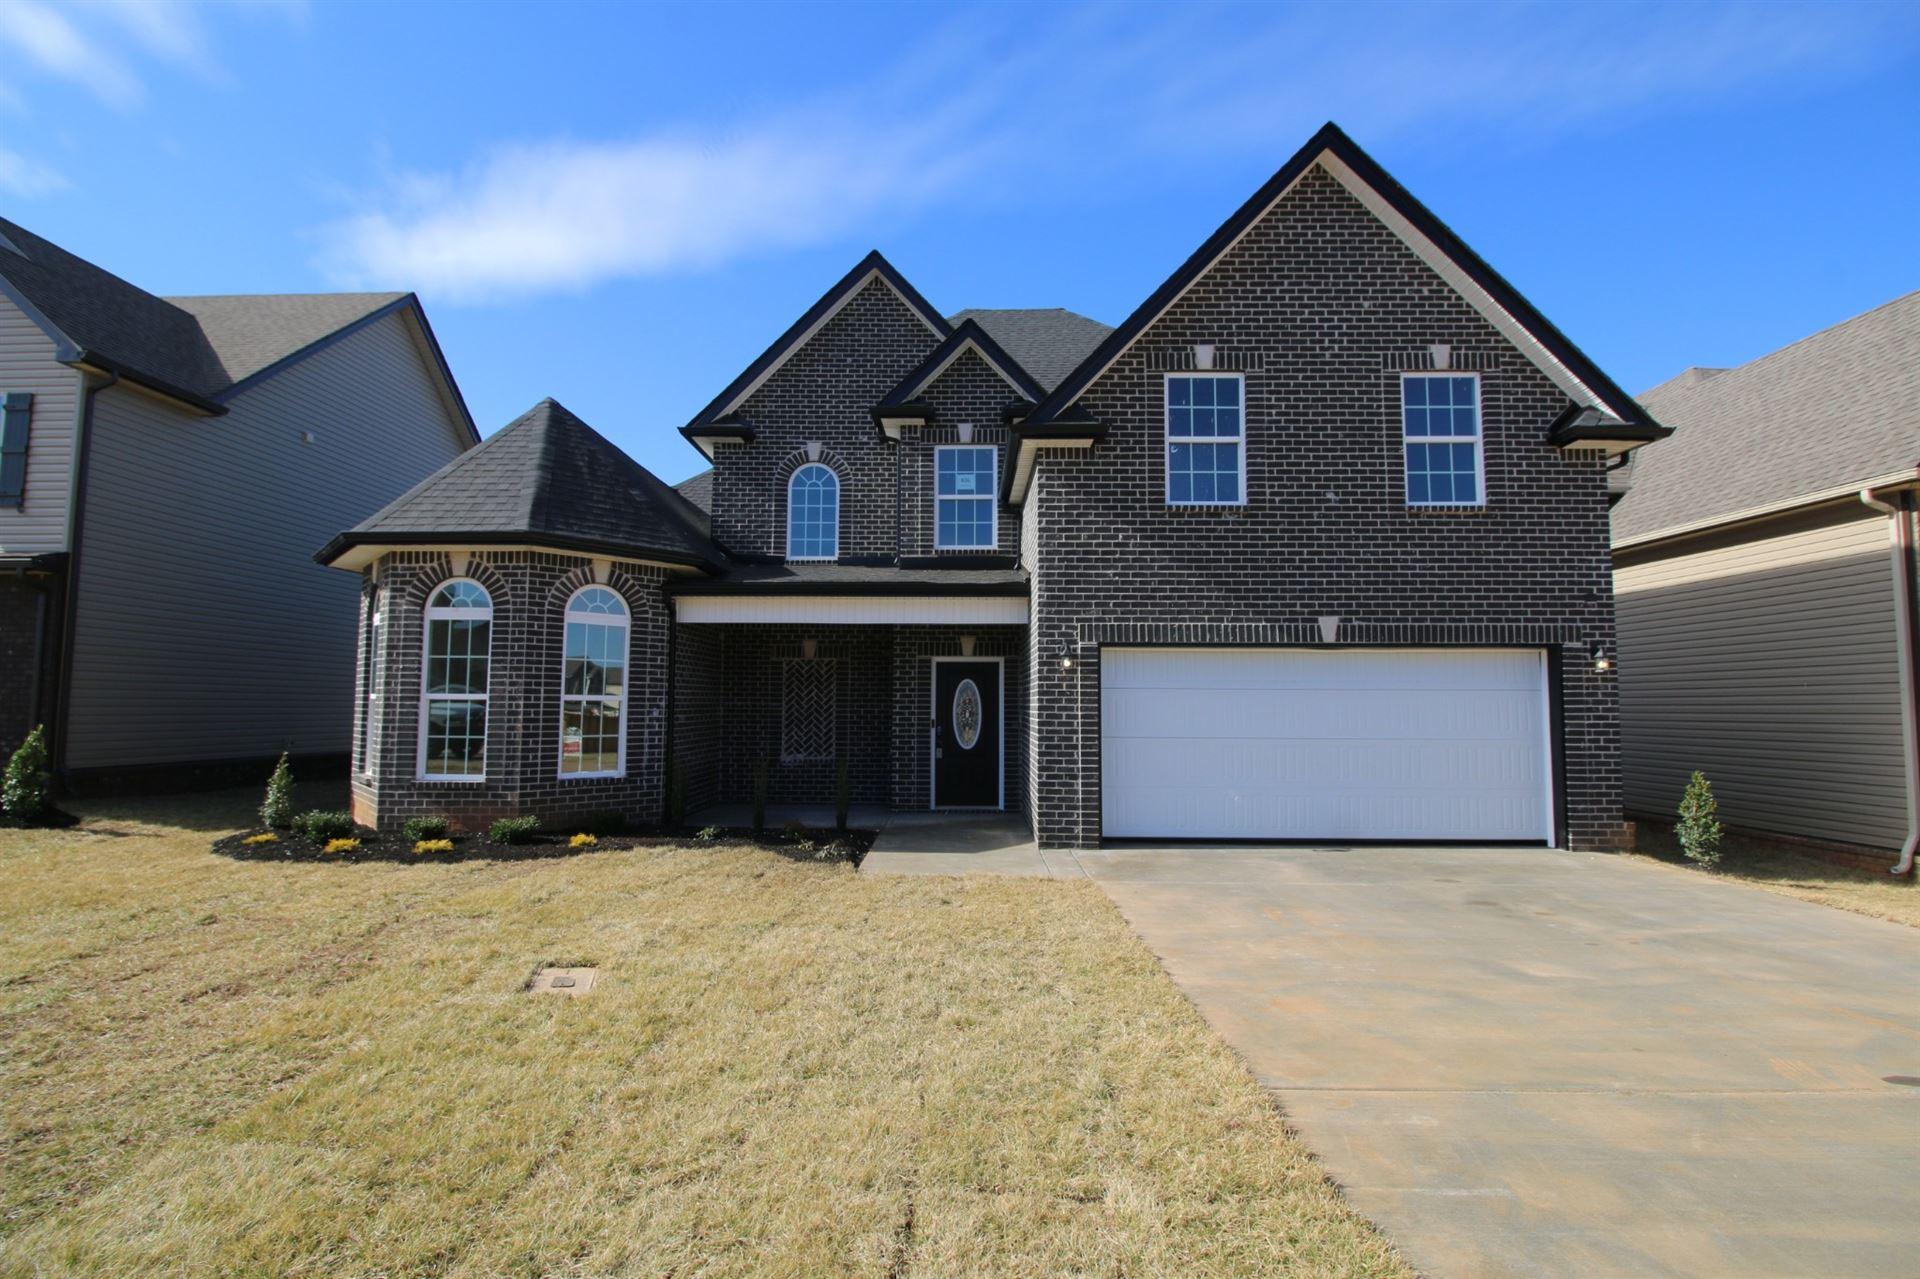 406 Summerfield, Clarksville, TN 37040 - MLS#: 2297987